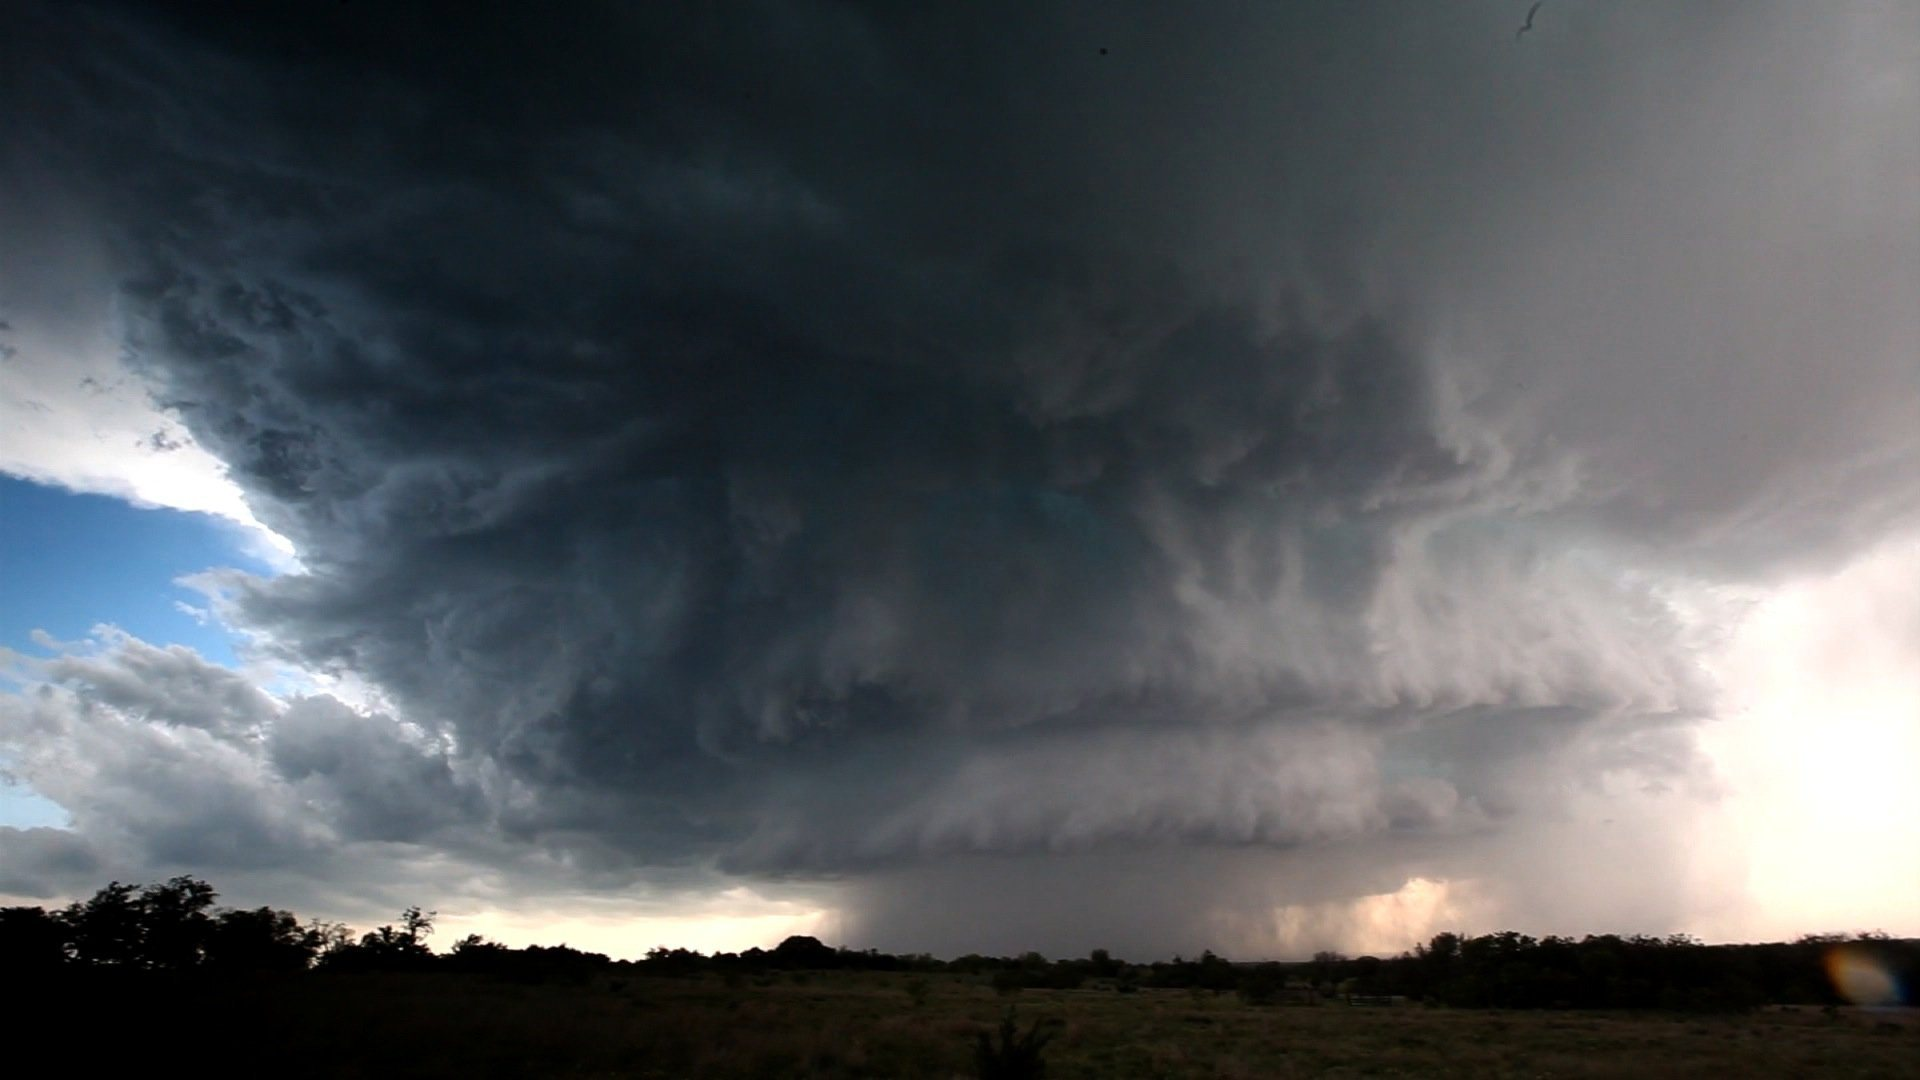 Texas_storm_170.png - 1600603 Bytes